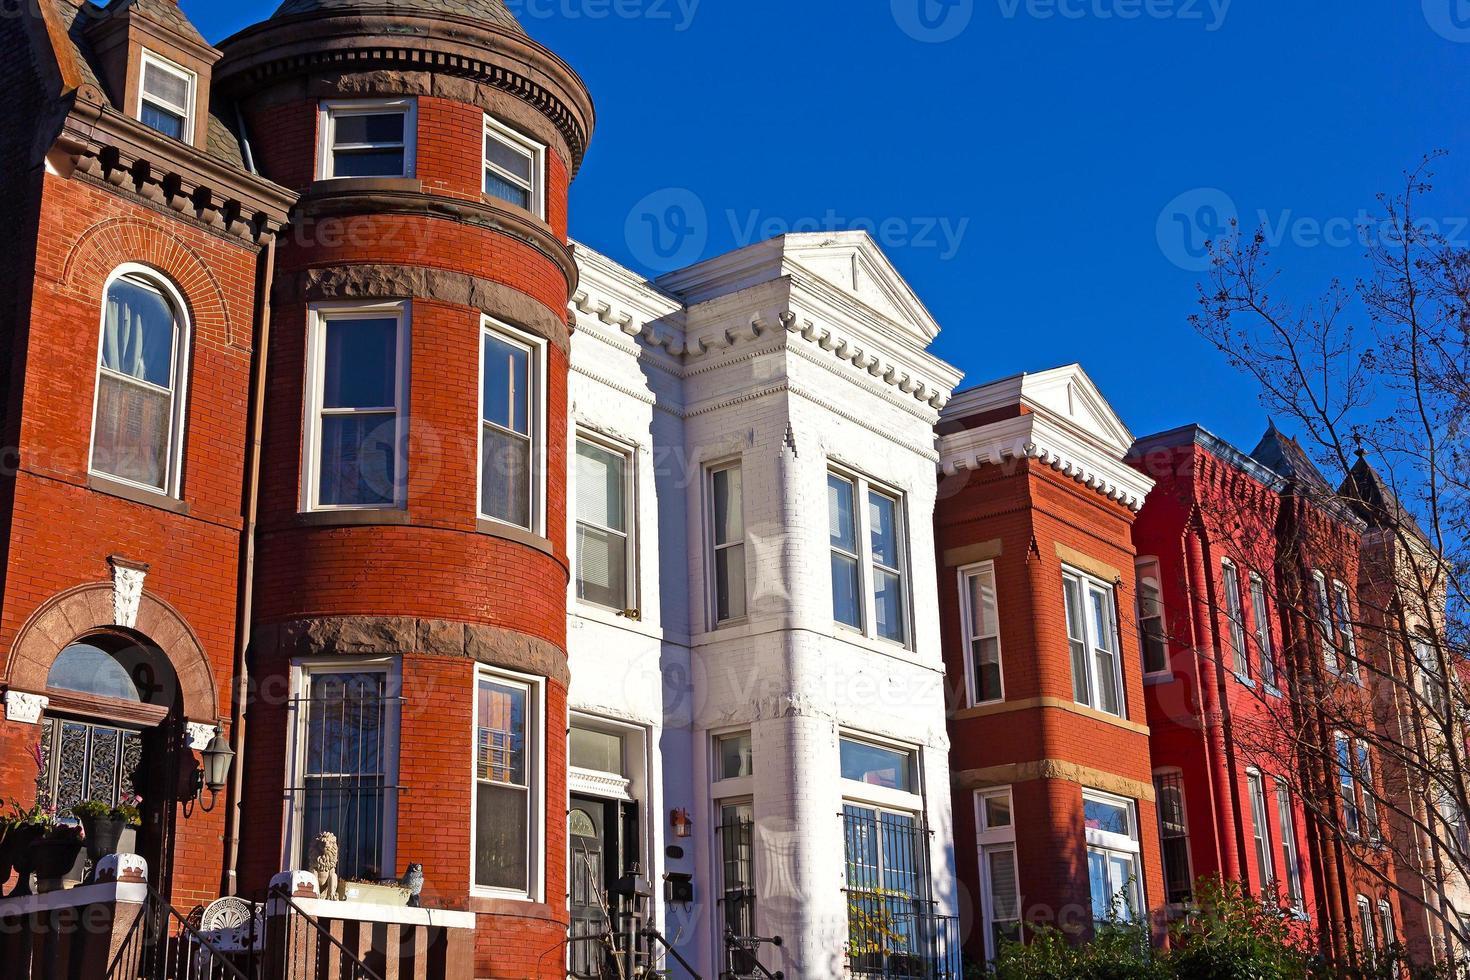 arquitectura urbana histórica en el suburbio de Mount Vernon de Washington DC. foto